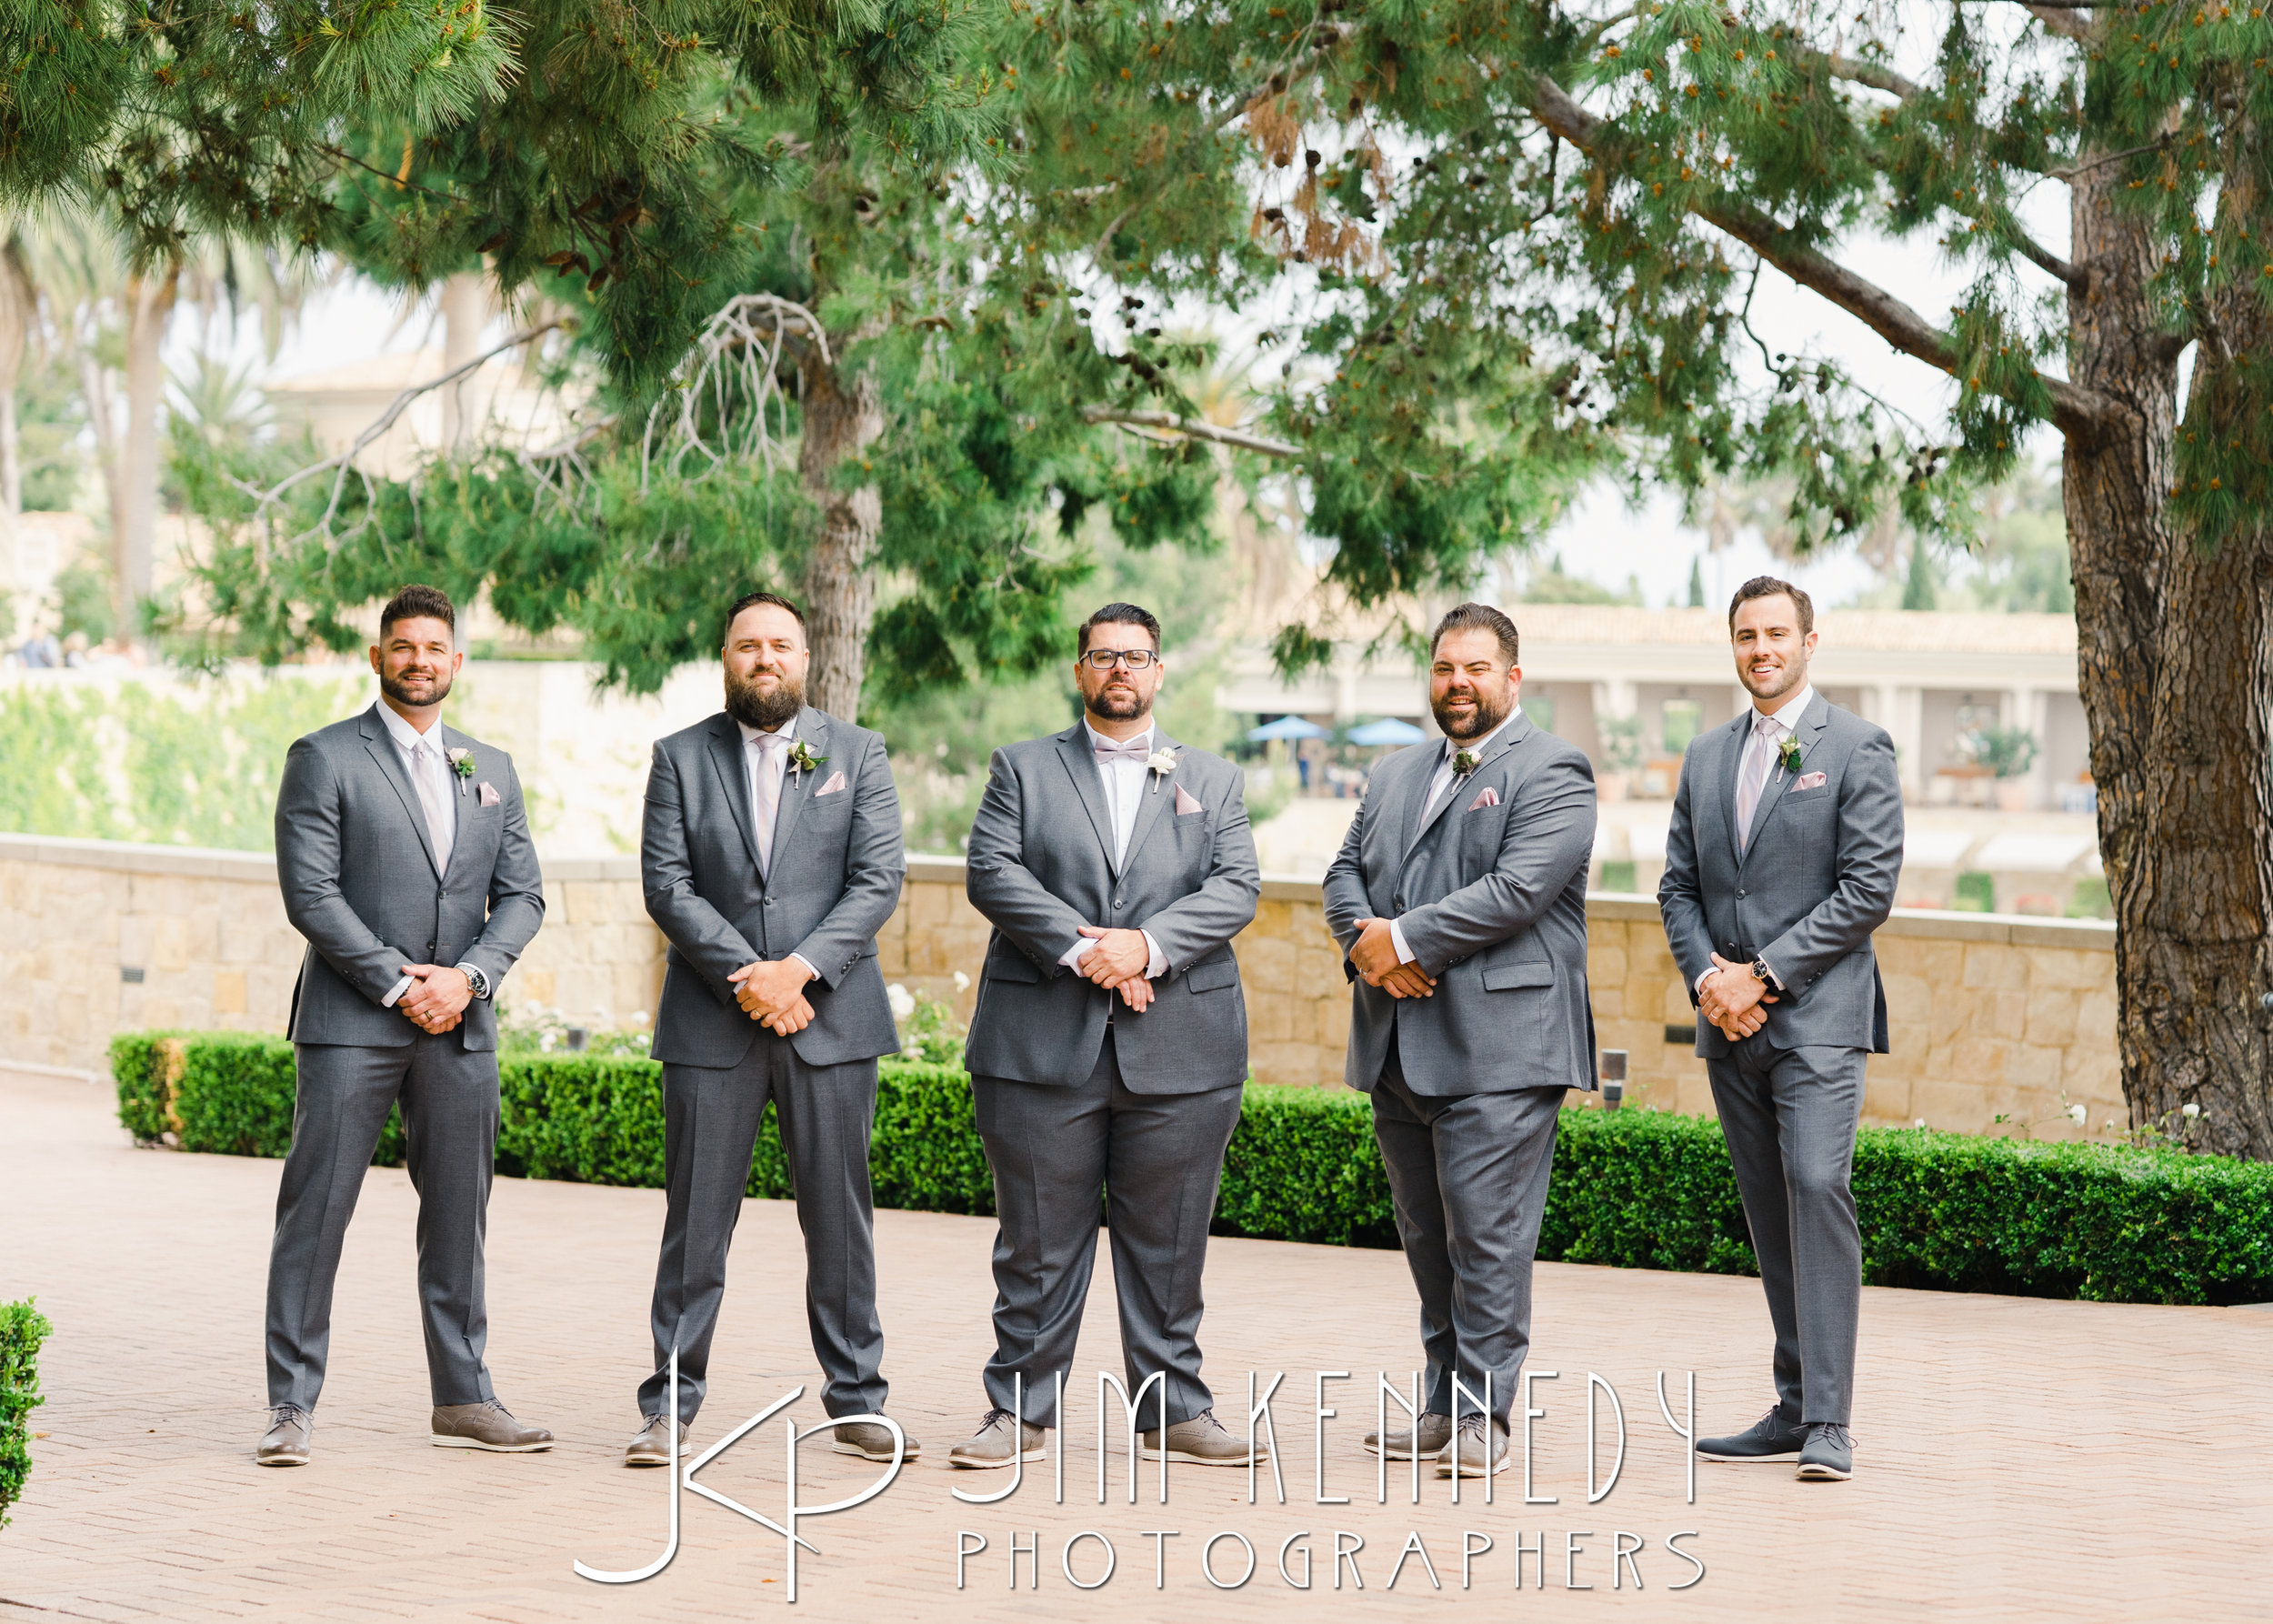 pelican-hill-wedding-jim-kenedy-photographers_0079.JPG